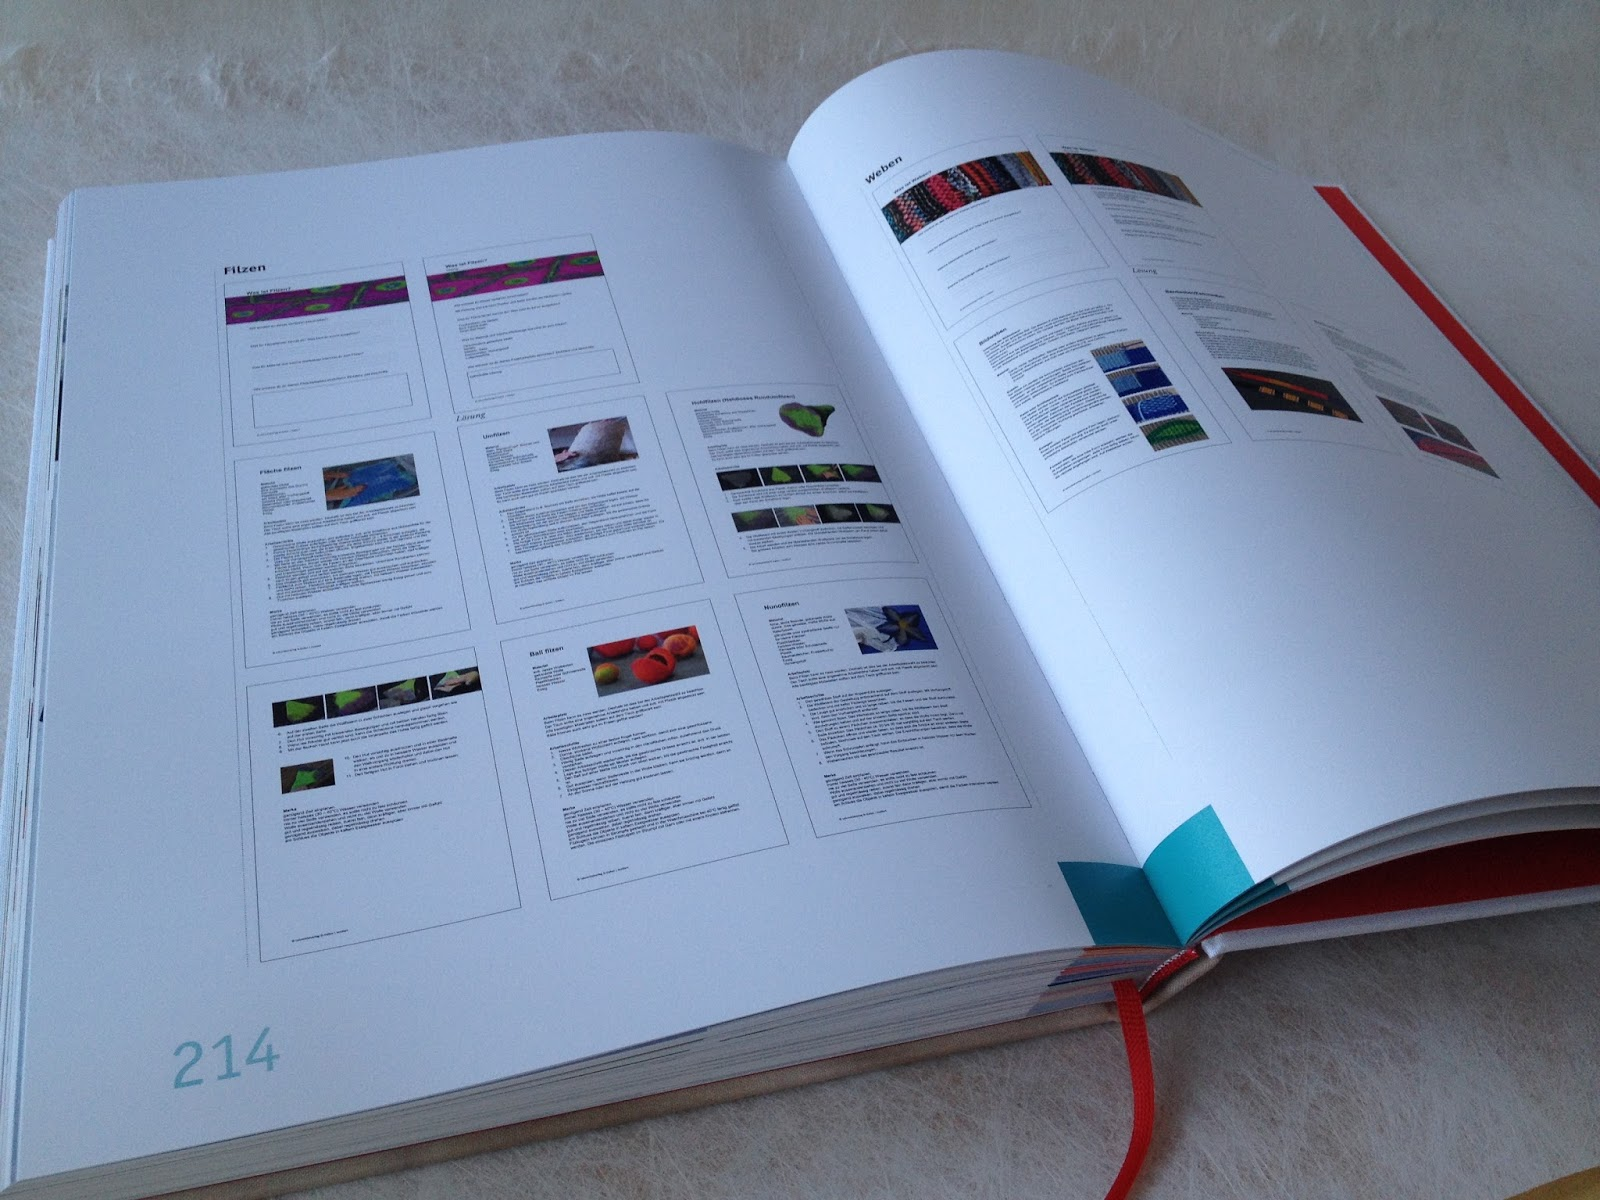 Textile Art Forum: Bücher!Bücher!Bücher!